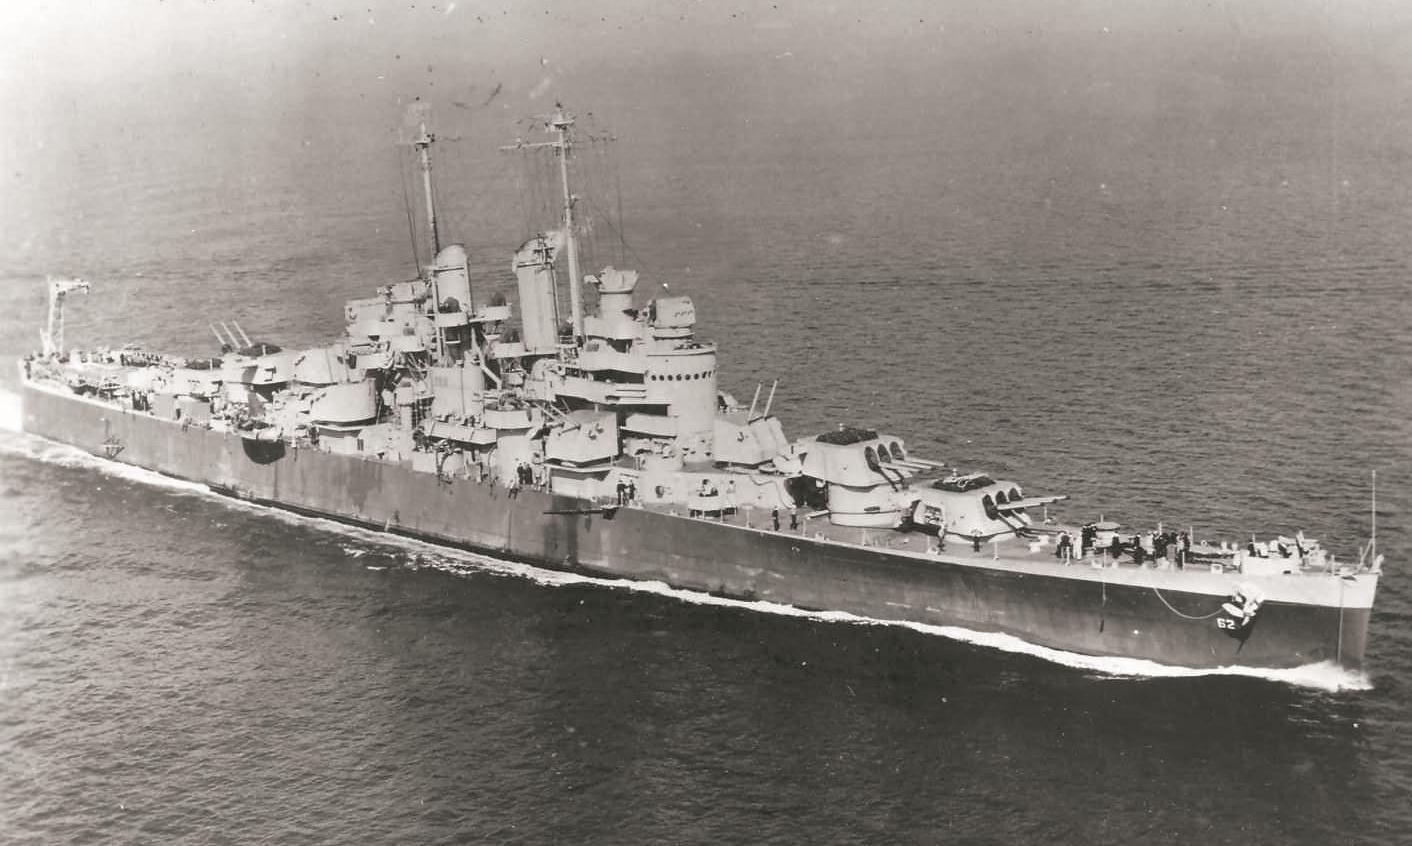 Ashland's oldest World War II vet recalls battles at sea